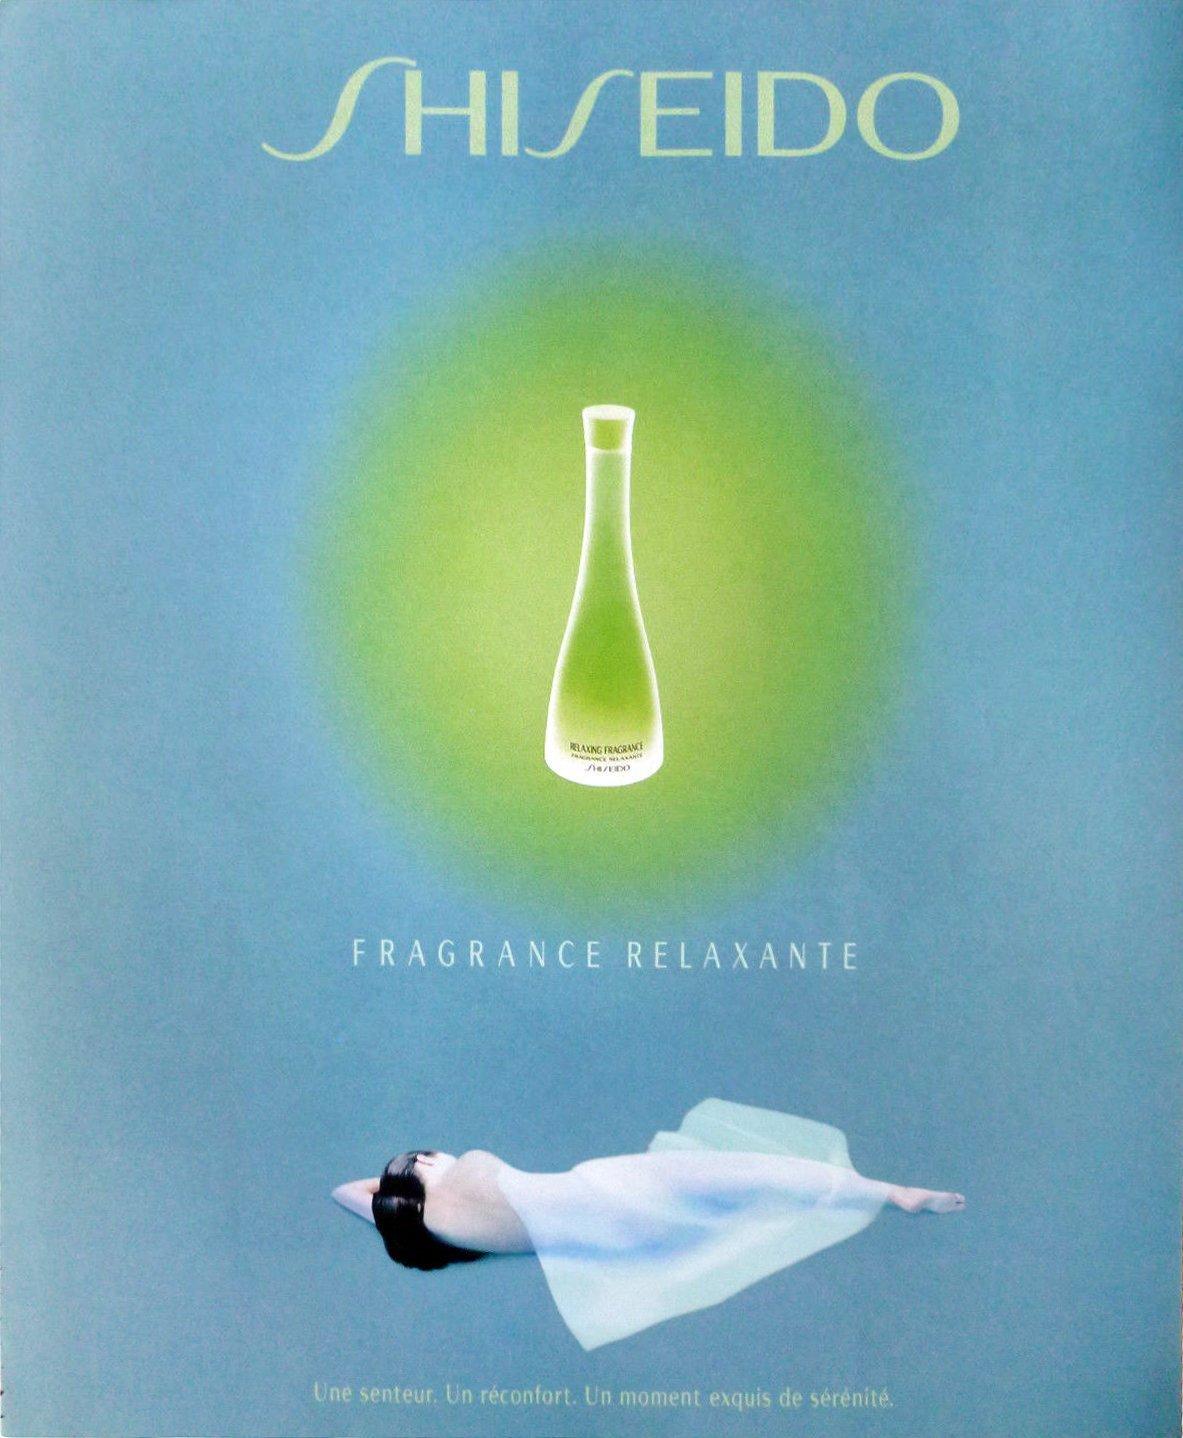 Relaxing Fragrancefragrance Relaxante / リラクシングフレグランス Shiseido / 資生堂  (1997)Eau De Parfum avec Image Relaxante